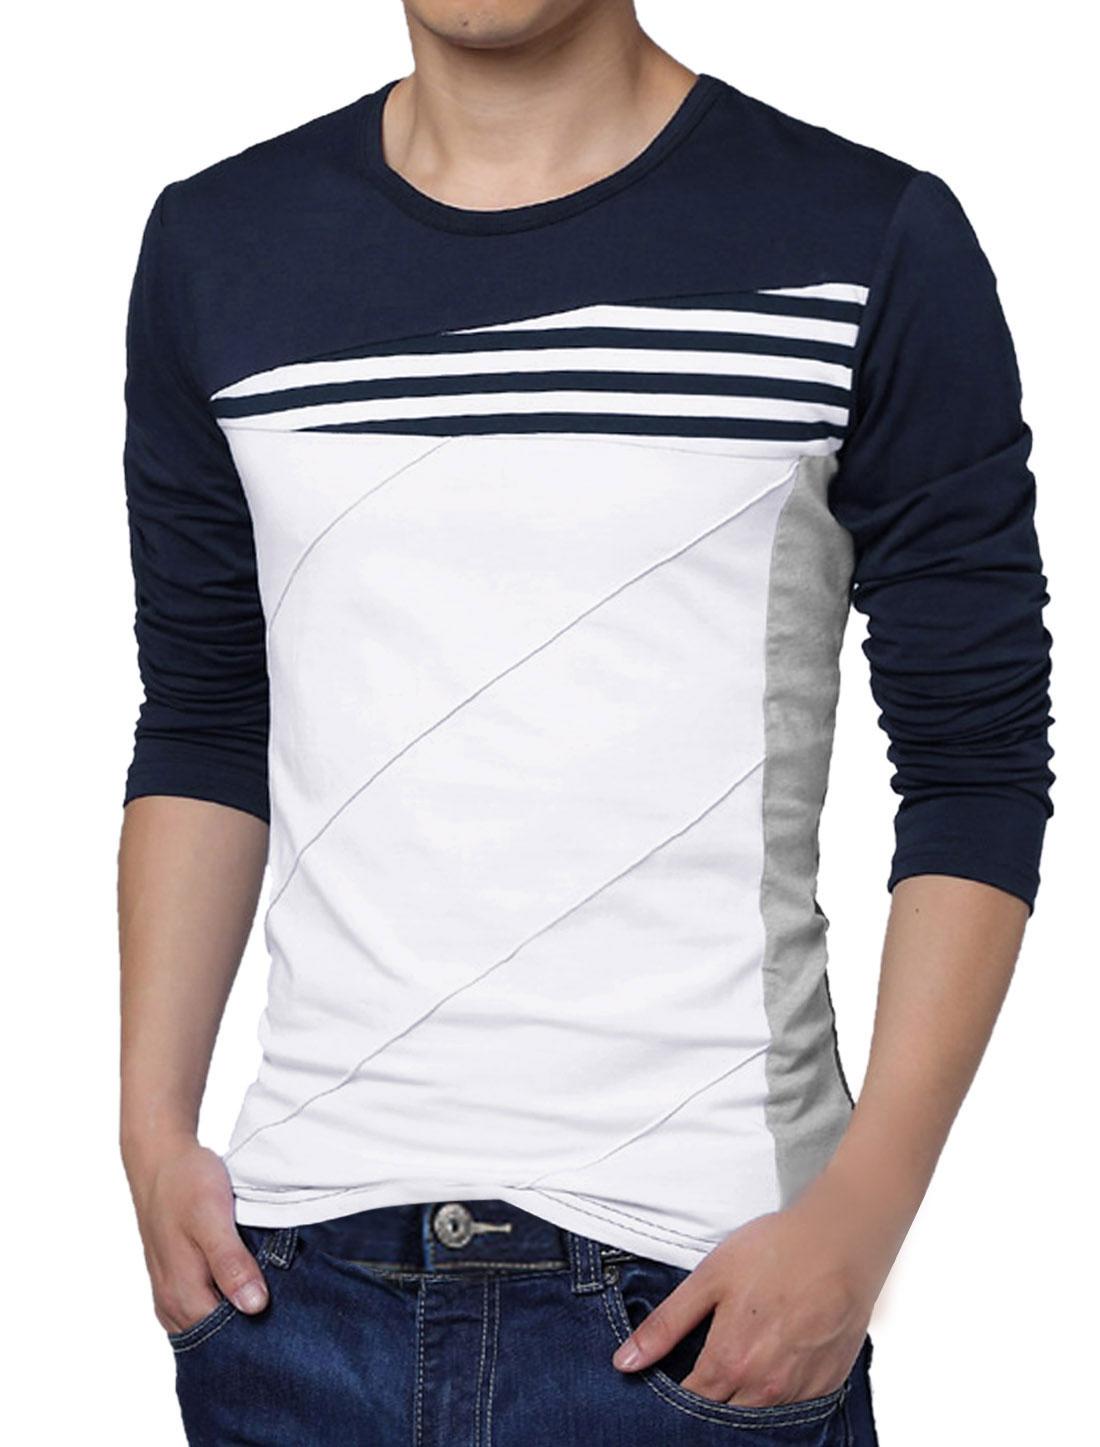 Men Long Sleeves Color Block Stripes Tee Shirt Blue White M